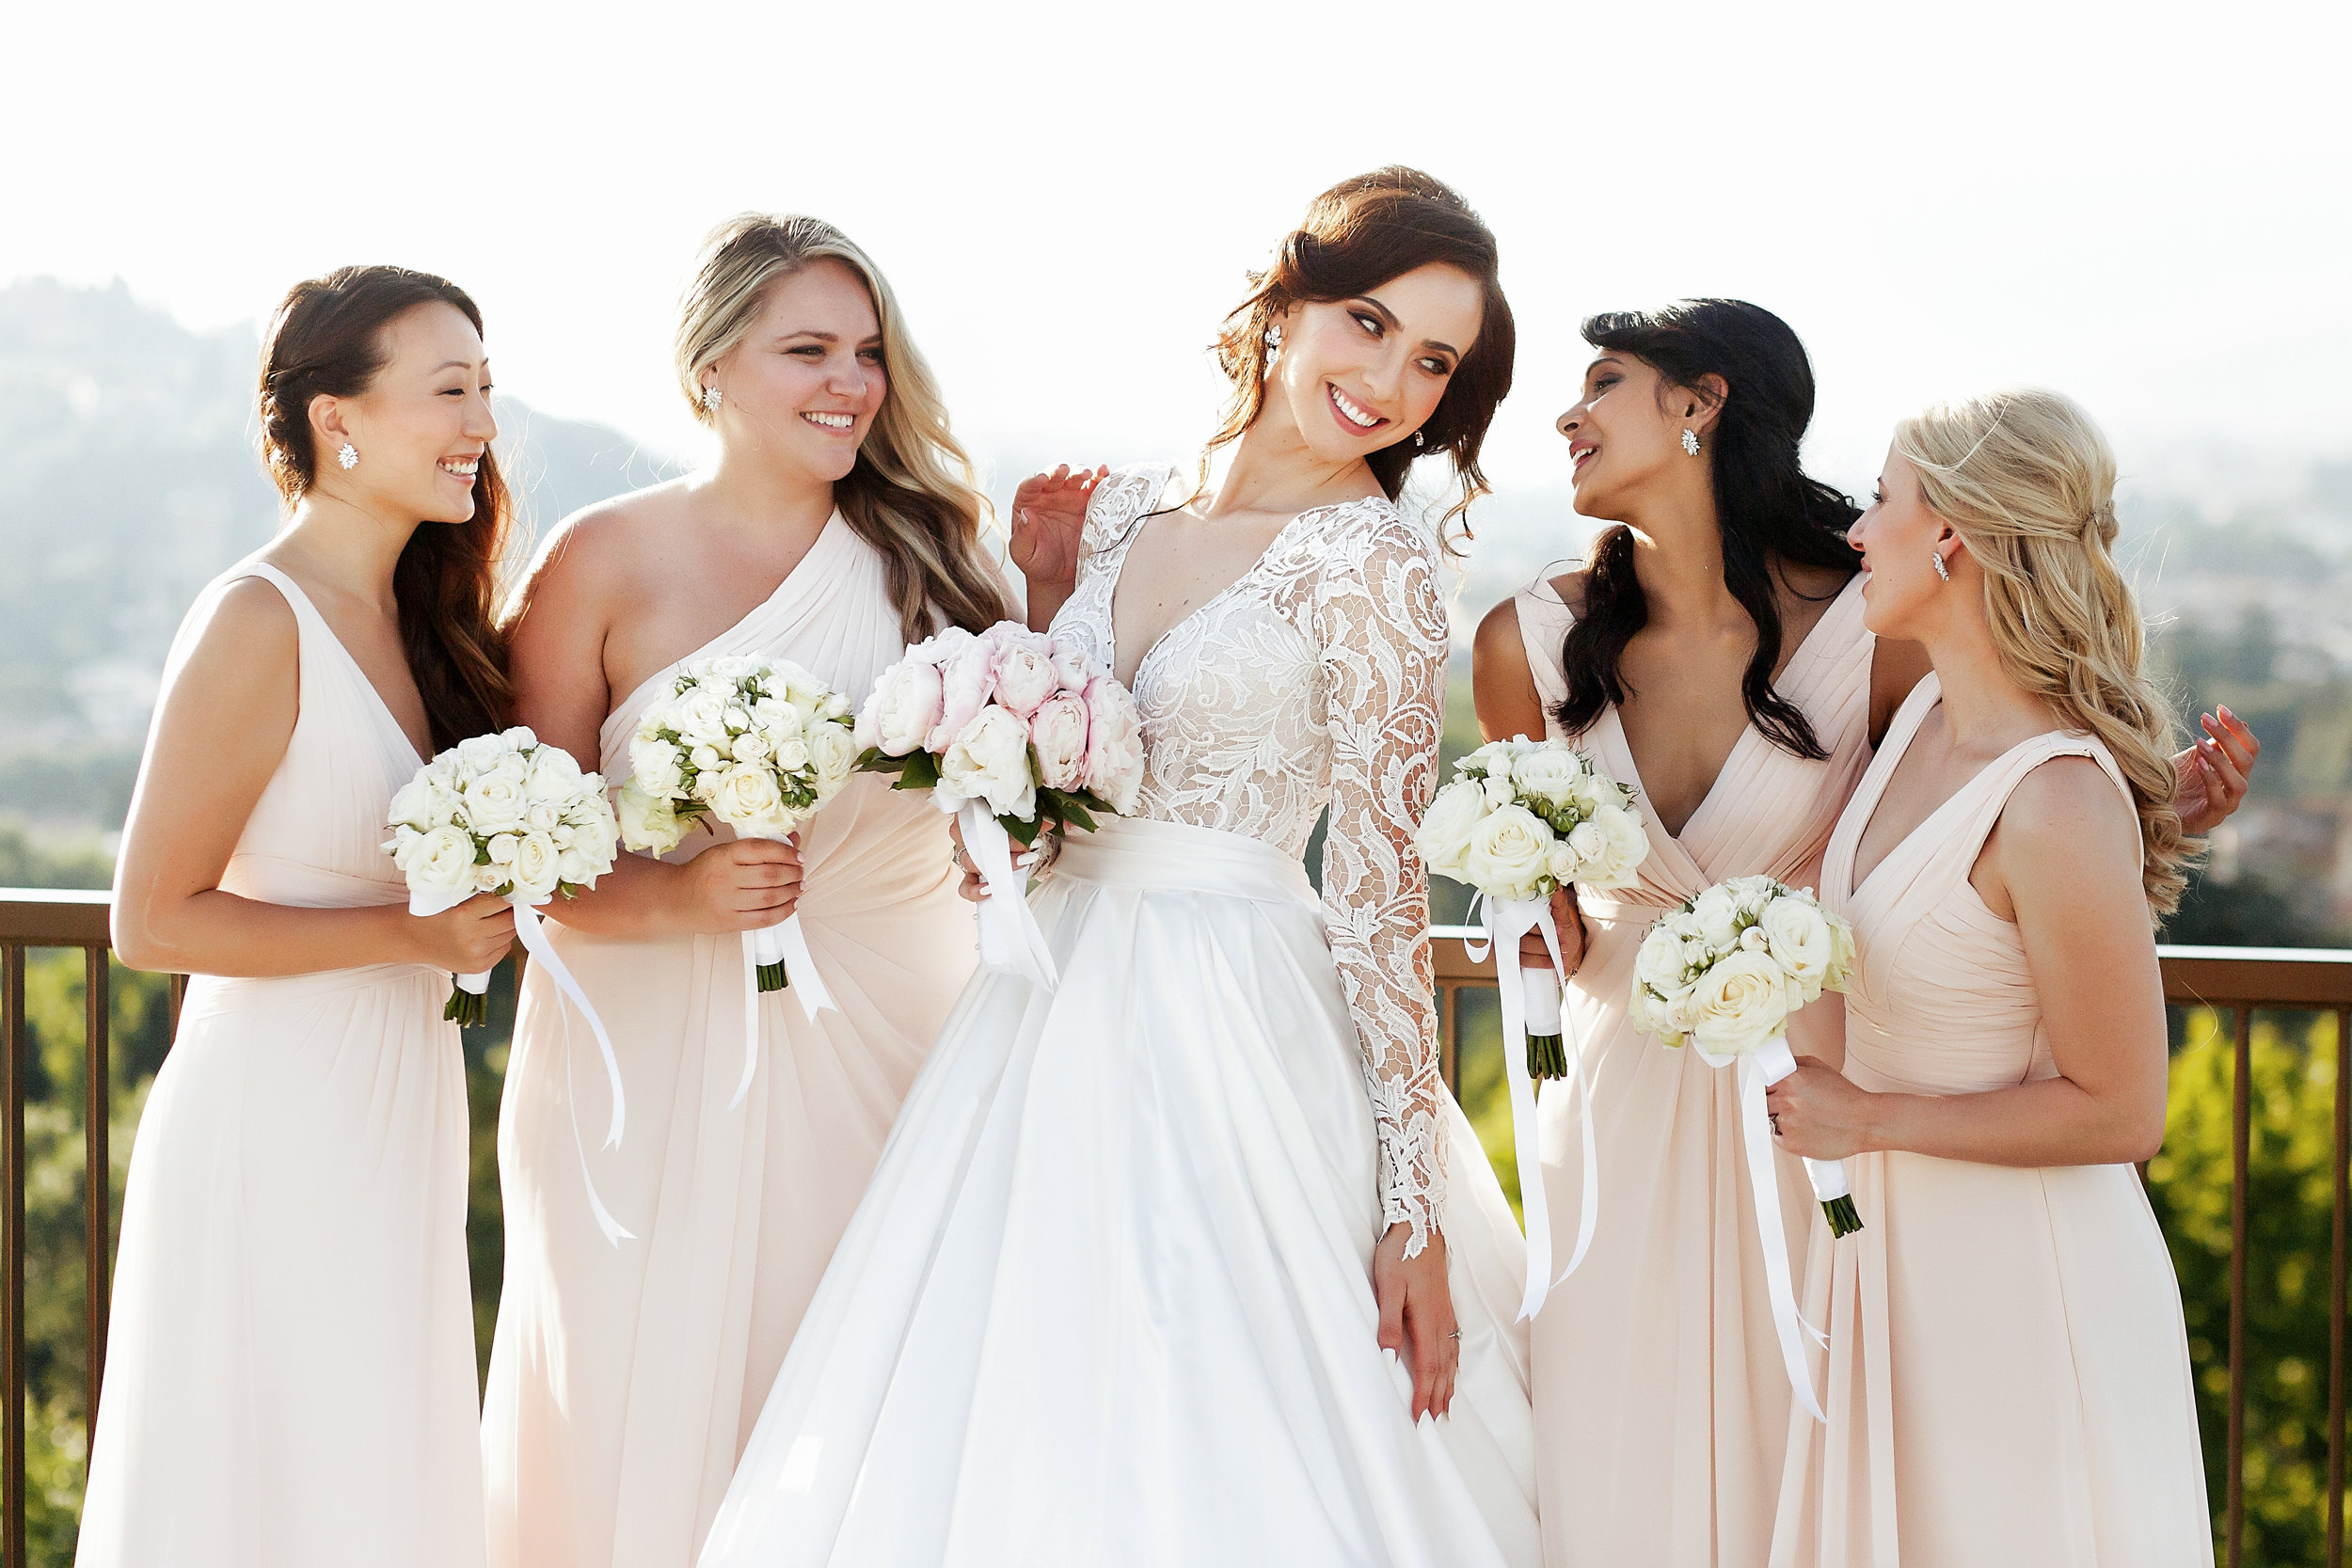 grace tyler bridesmaids.jpg